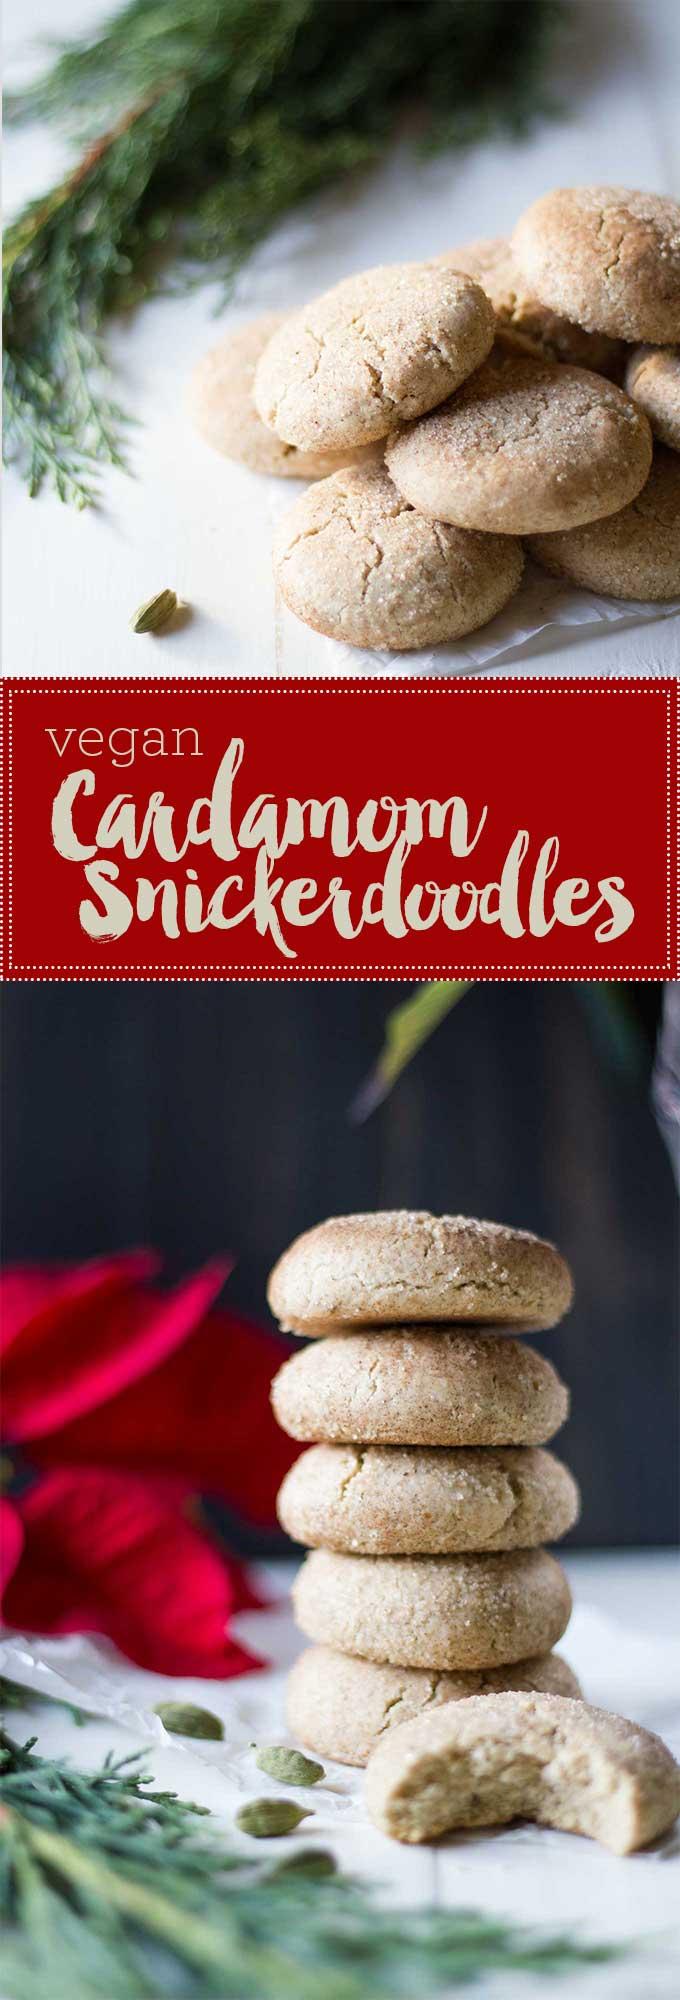 Vegan Cardamom Snickerdoodles